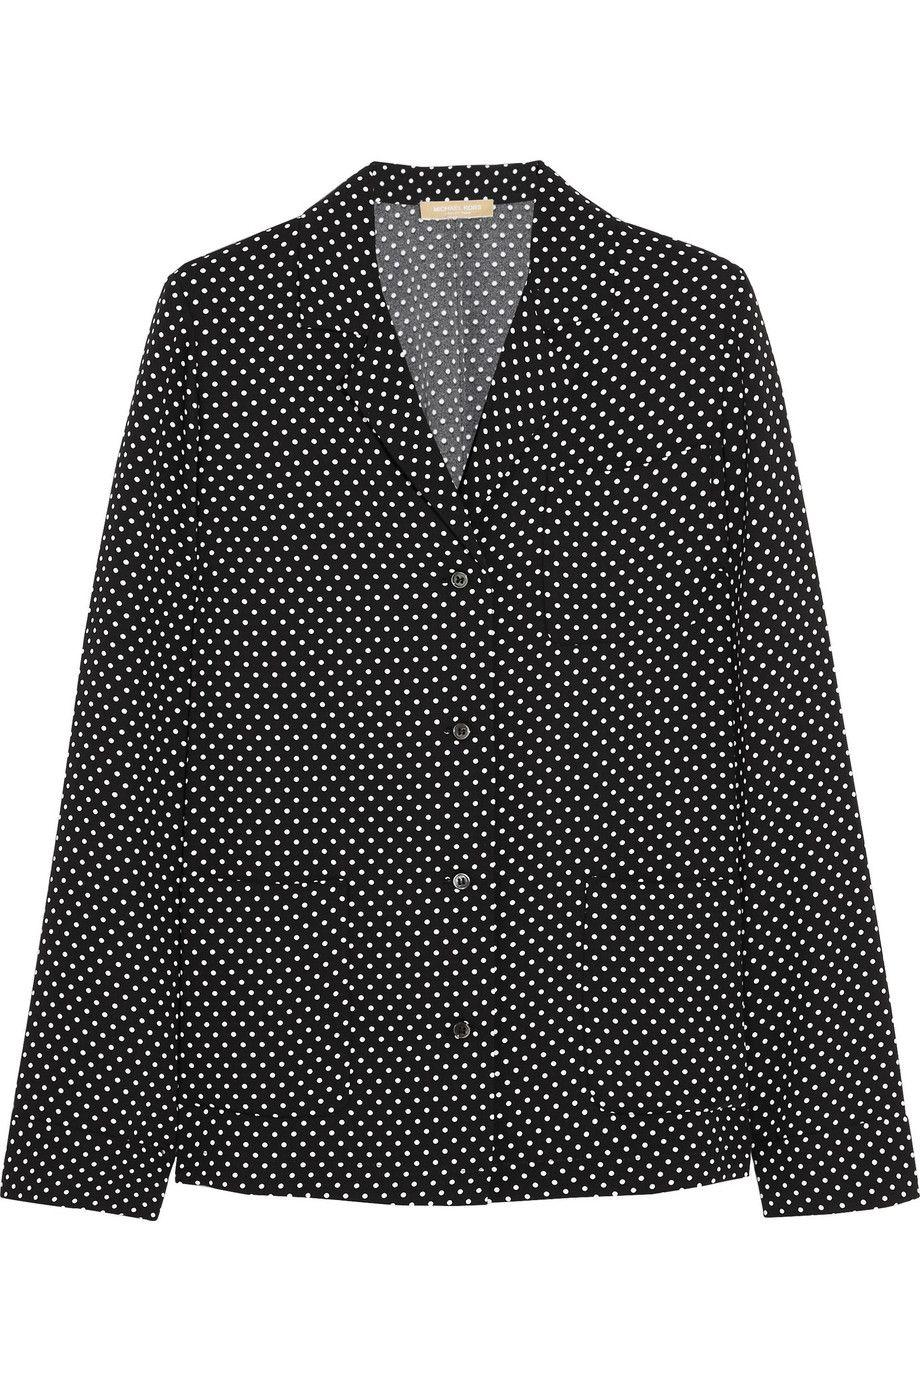 MICHAEL KORS Polka-dot satin-crepe shirt. #michaelkors #cloth #shirt